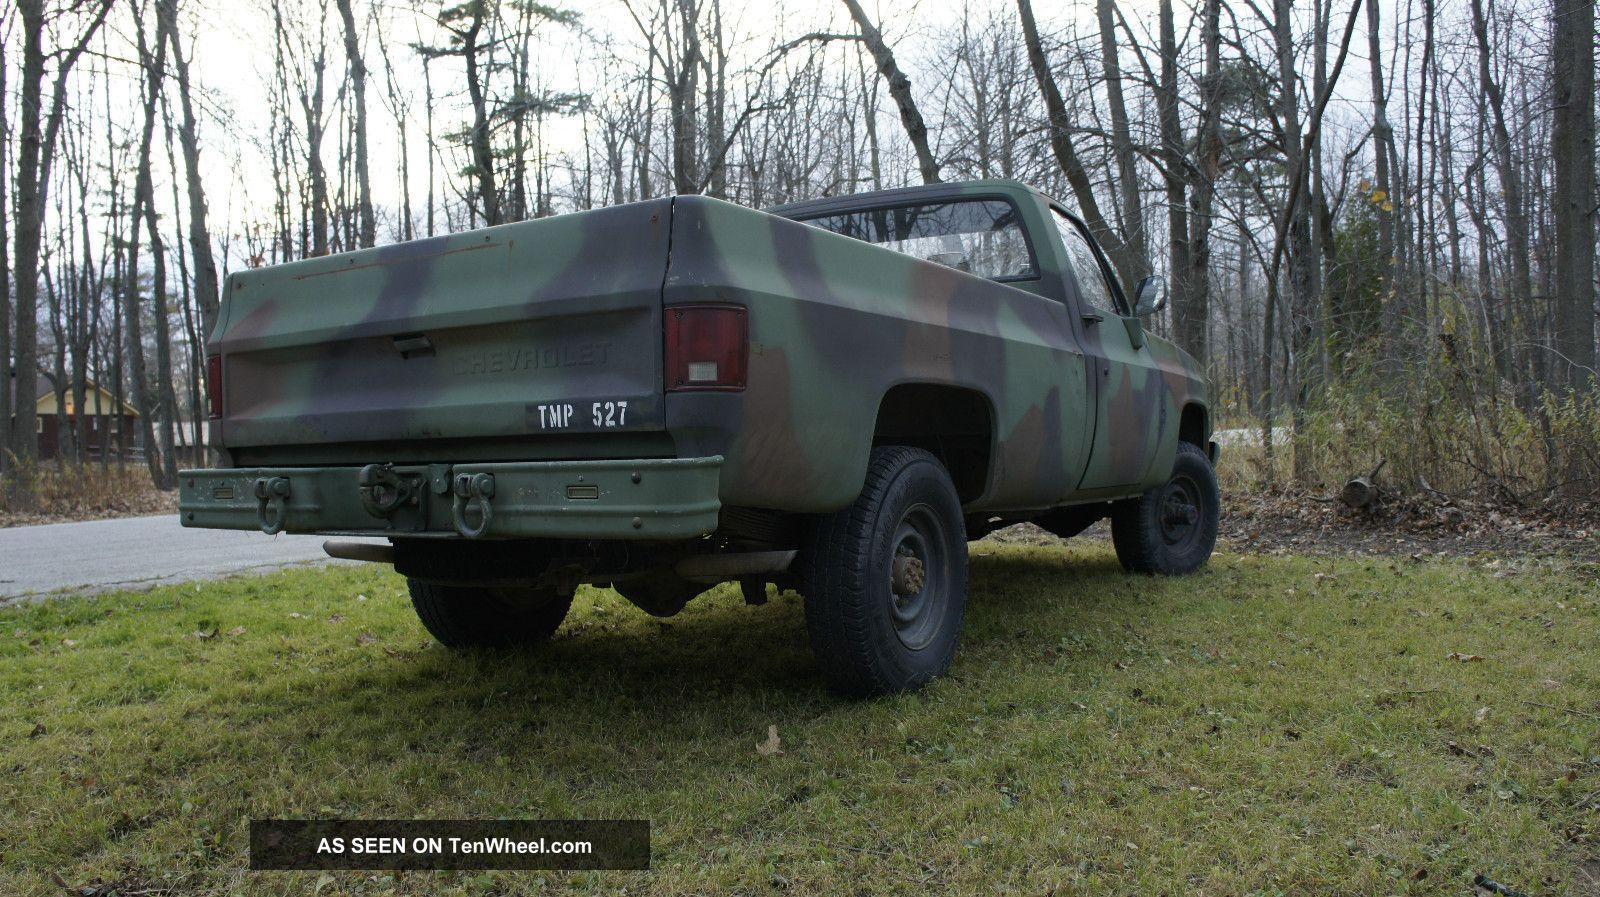 1986 Chevy M1008 Cucv K30 1 Ton Army Pick